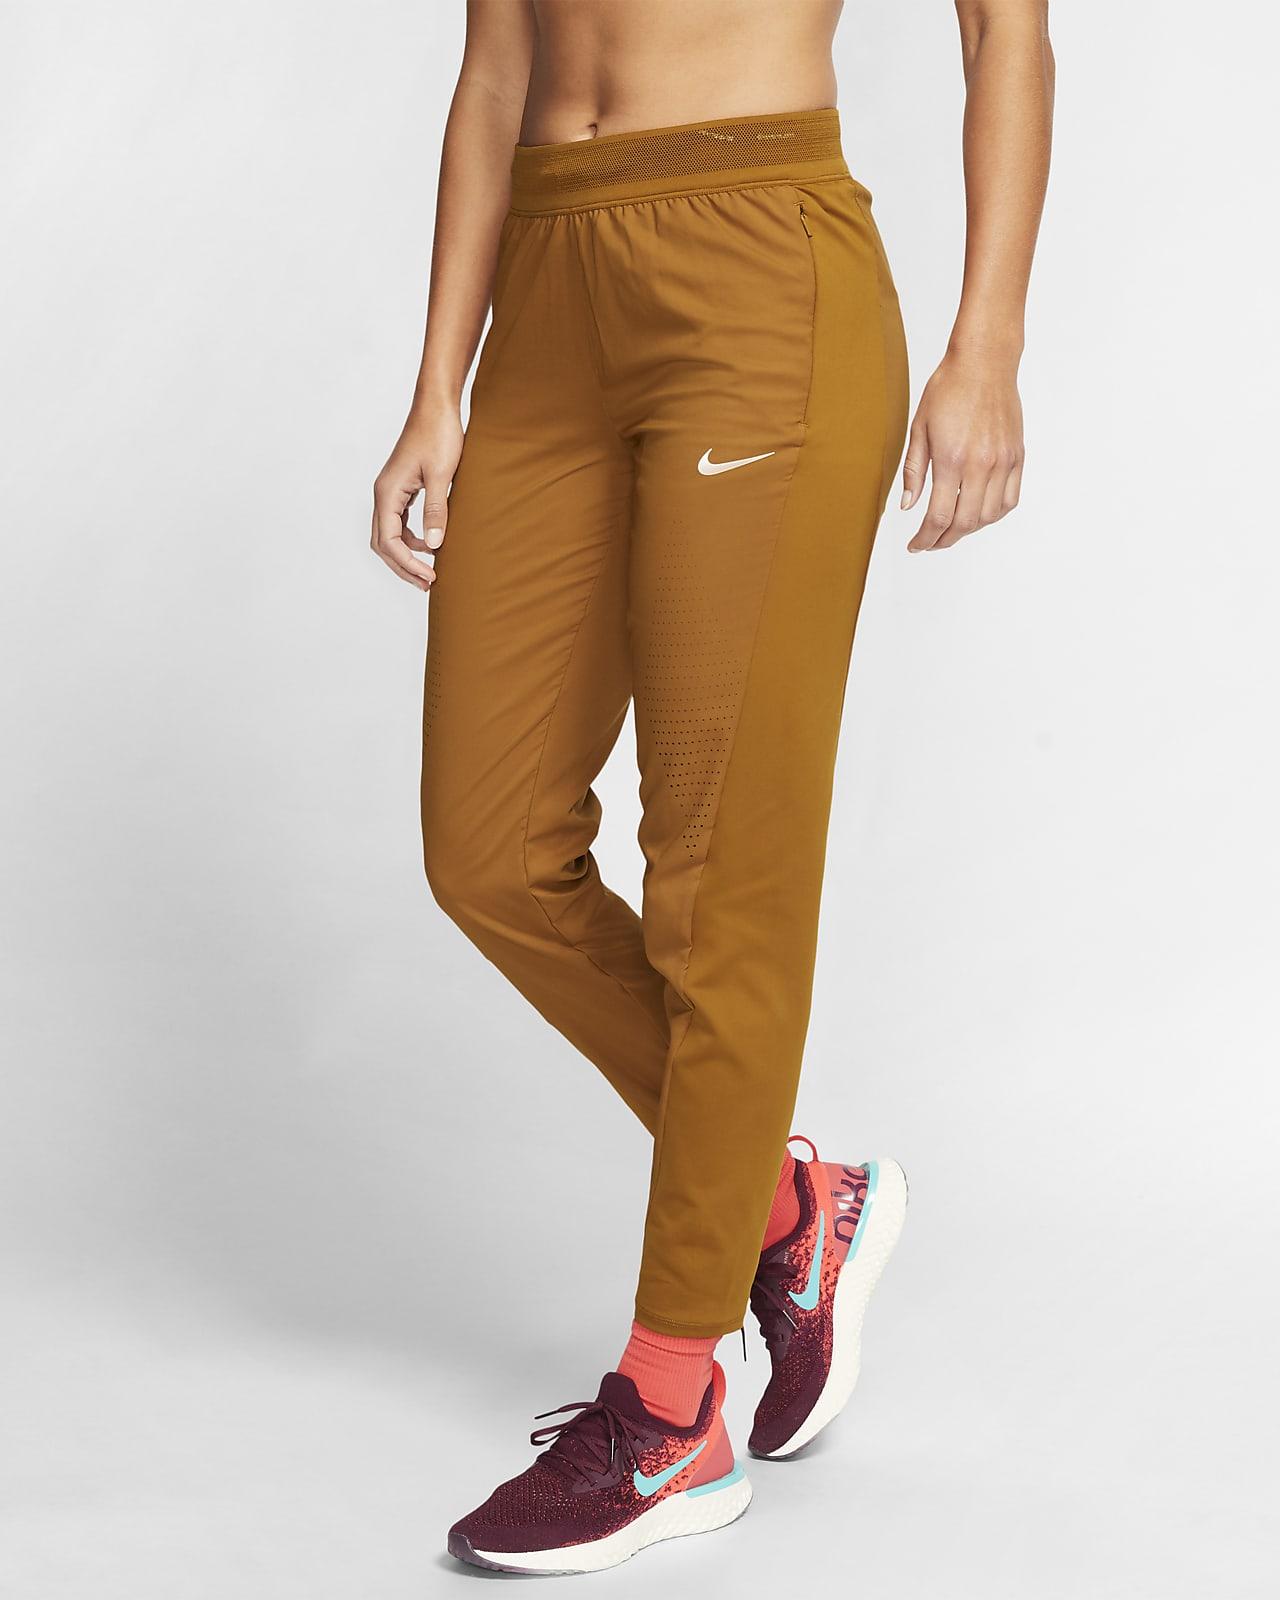 usted está espectro almohadilla  Nike Swift Women's Running Trousers. Nike LU